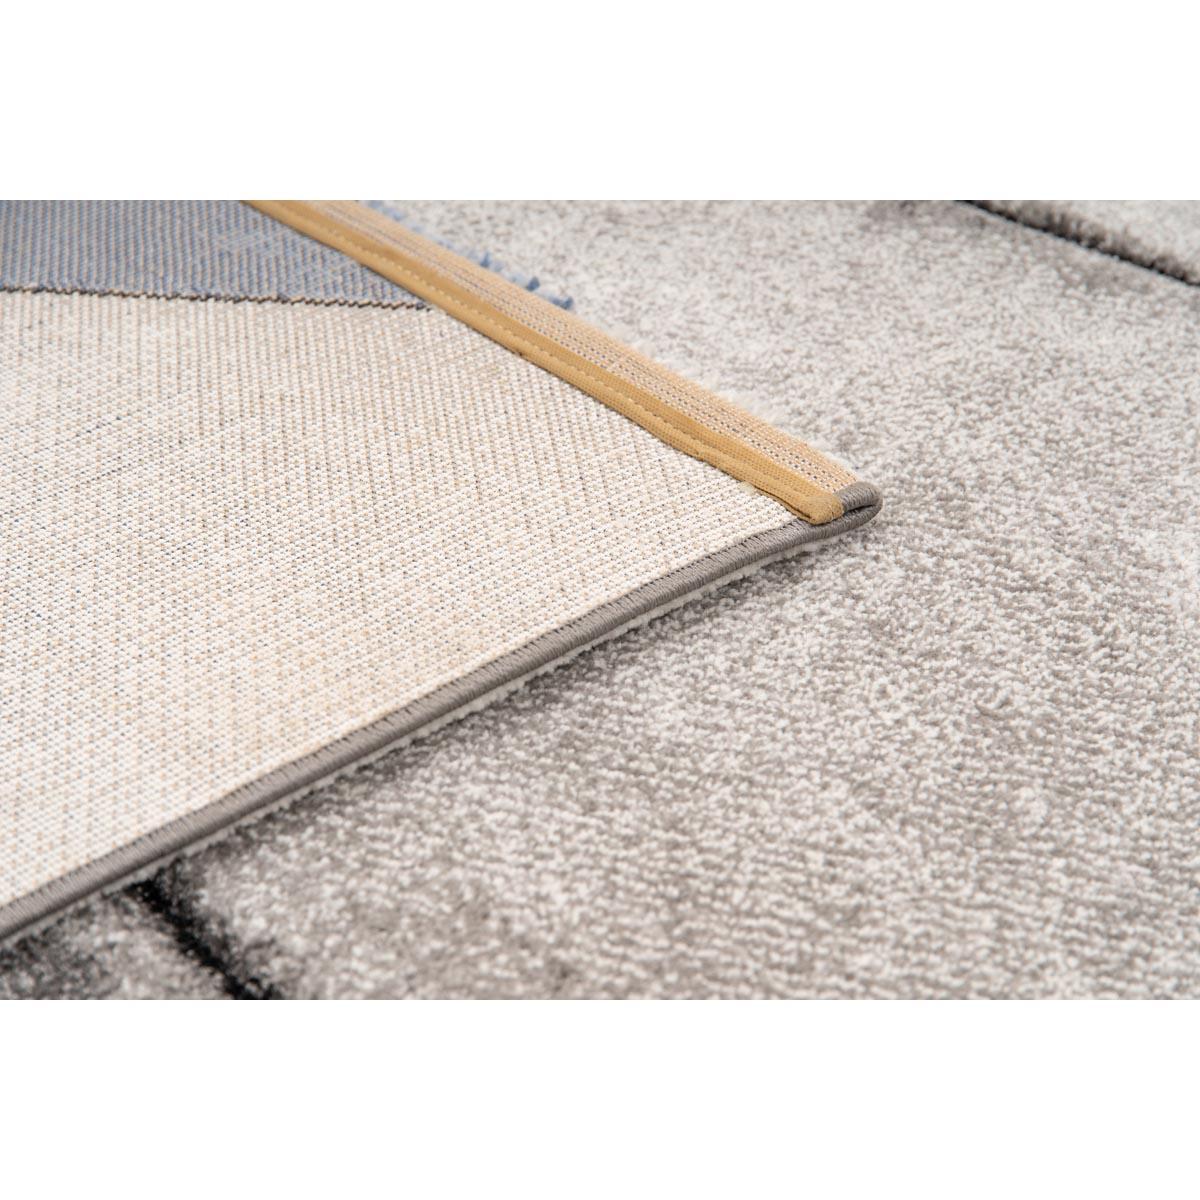 Le Clear matta mönstrad detalj närbild